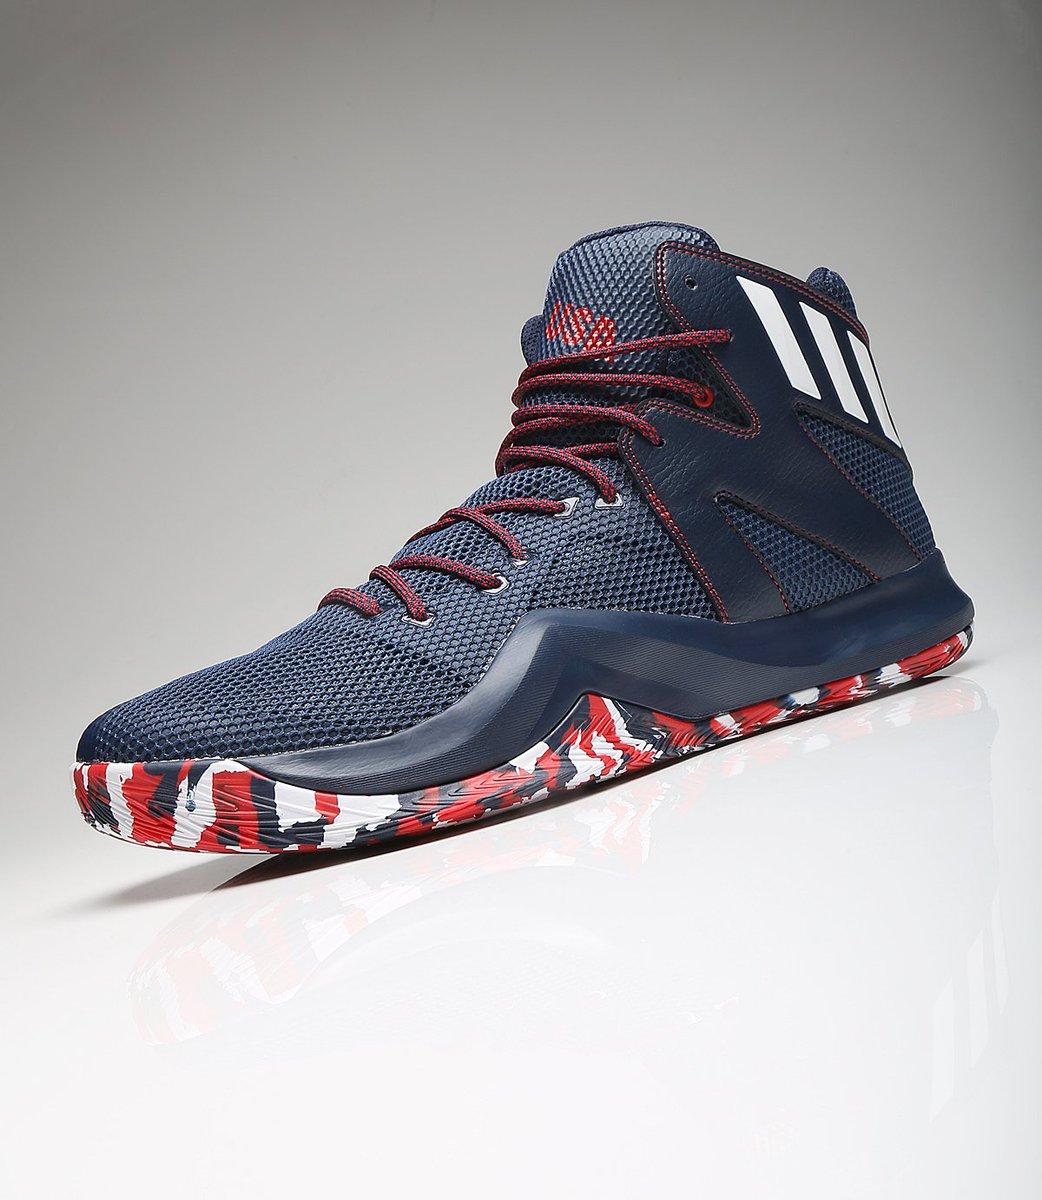 here s kyle lowry harrison barnes olympic shoes hbarnes klow7